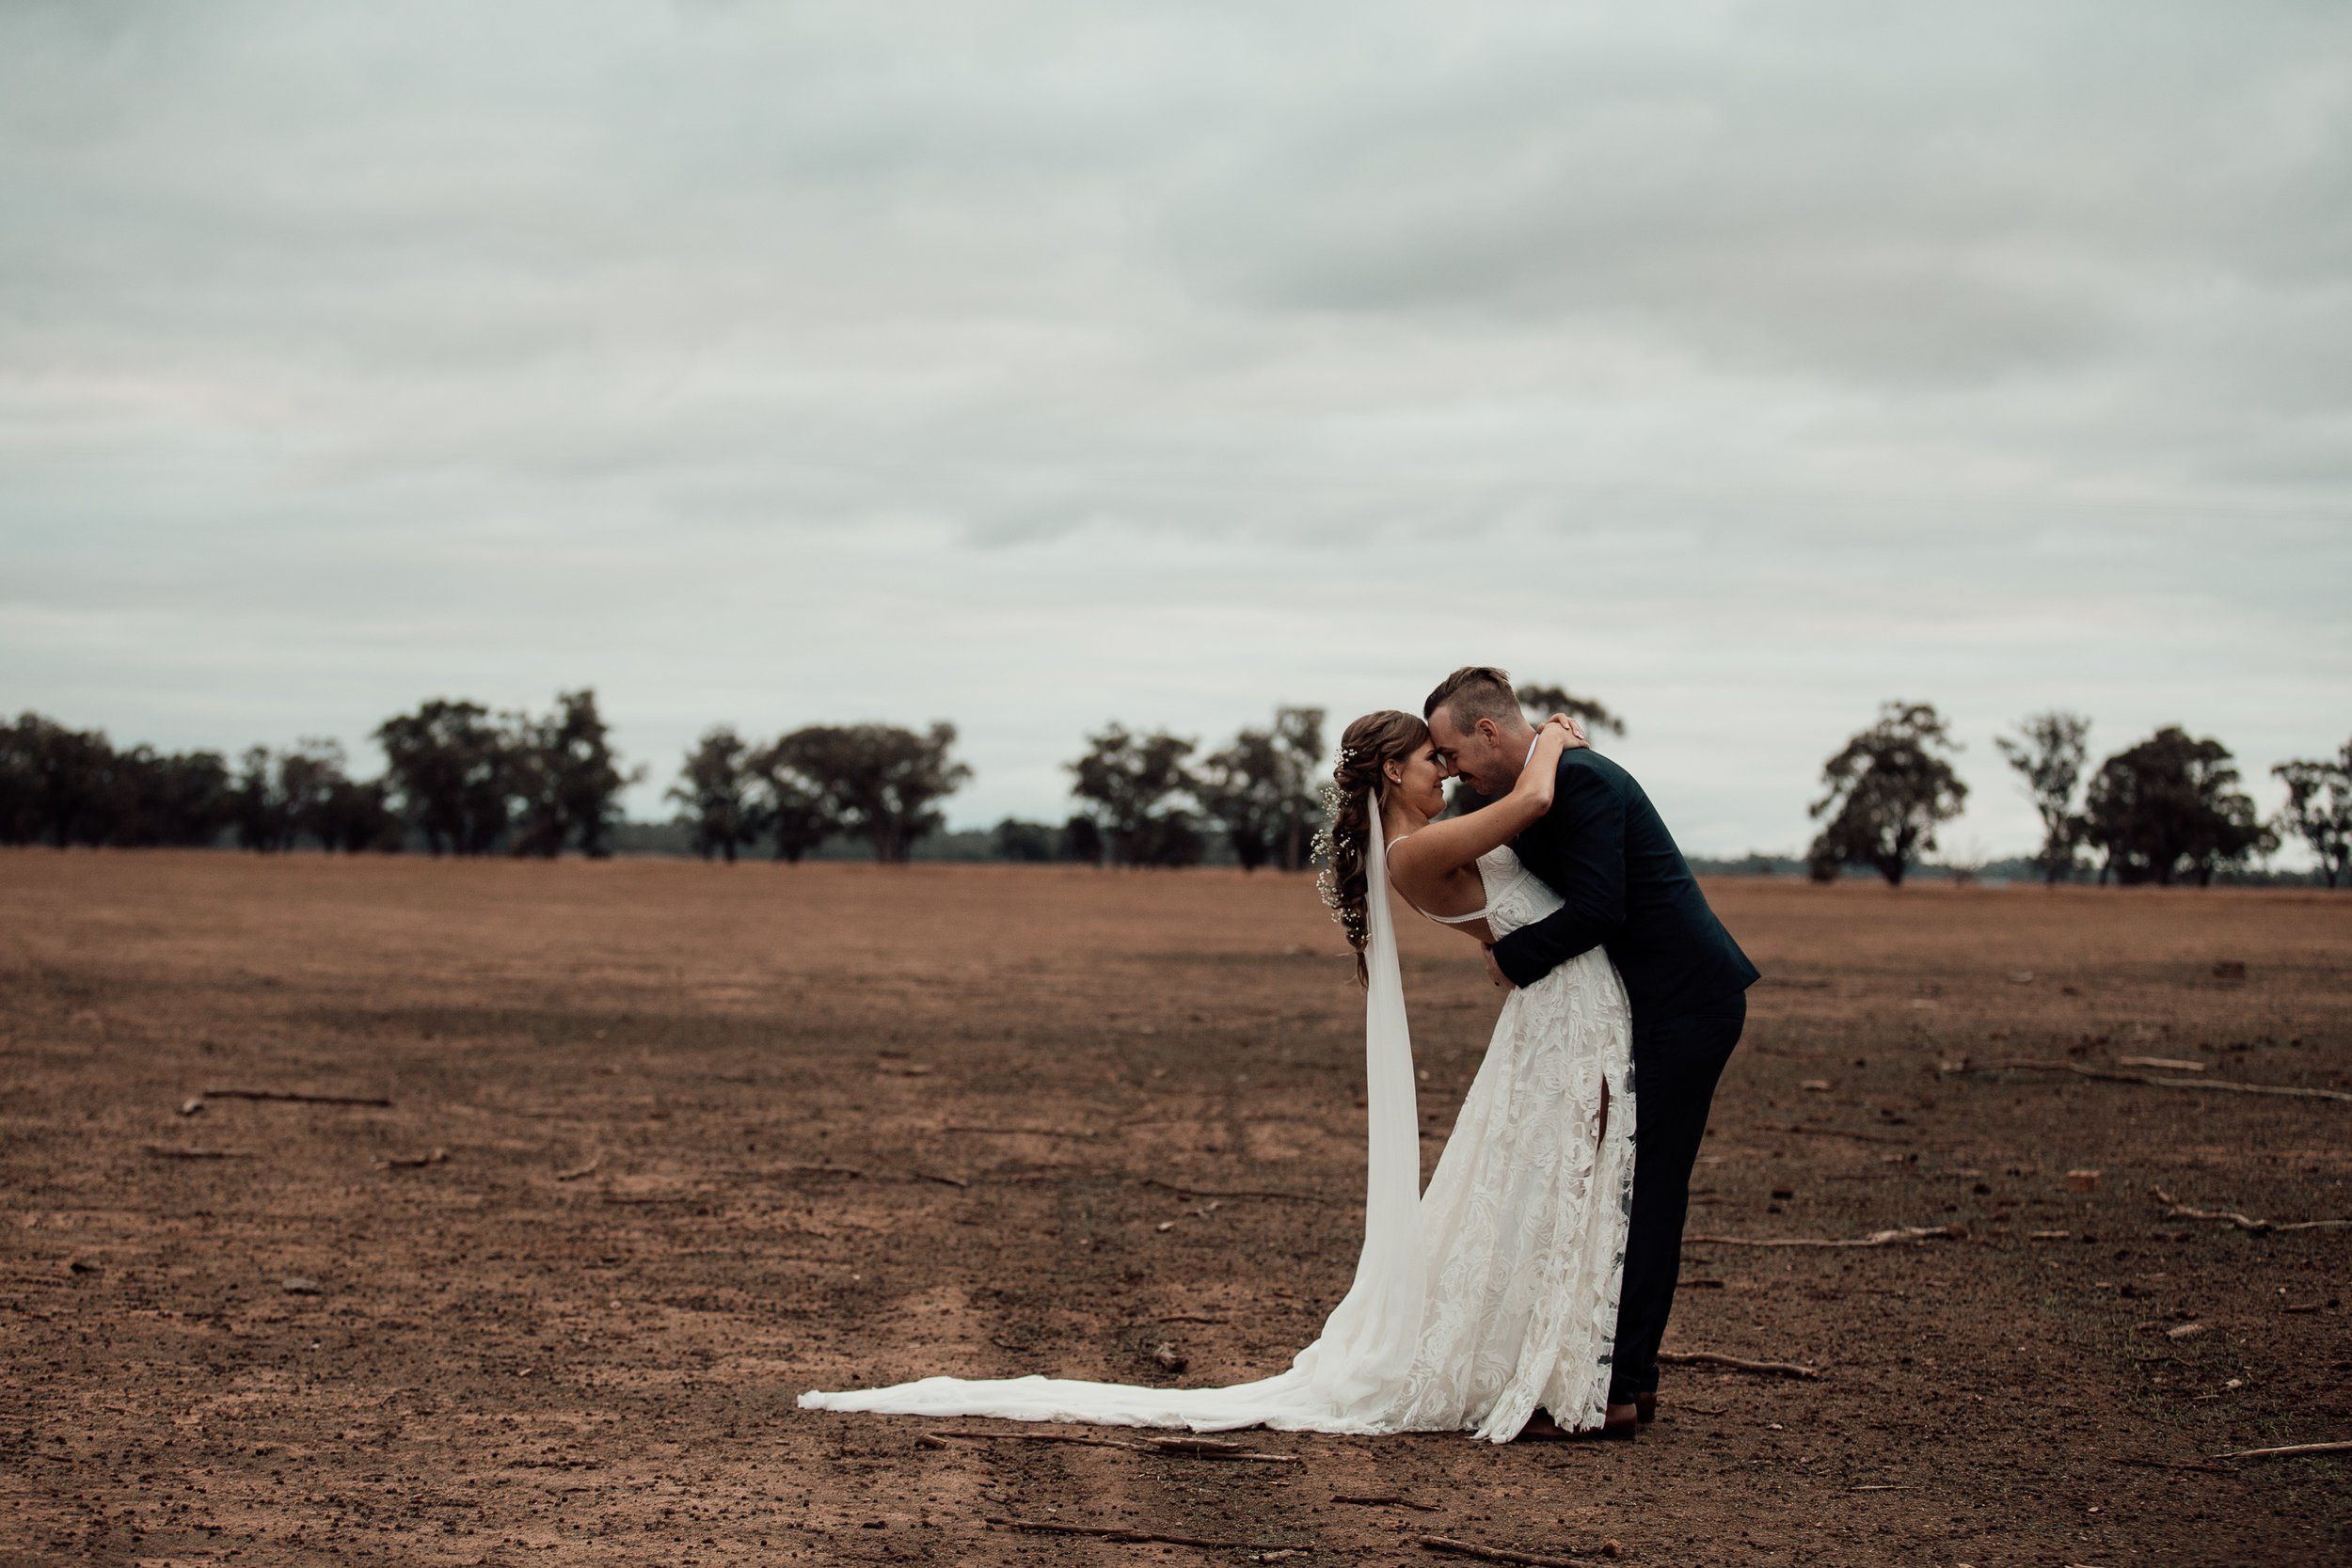 mickalathomas_puremacphotography_weddingphotographer_couplephotographer_Sheppartonphotographer_1467.jpg